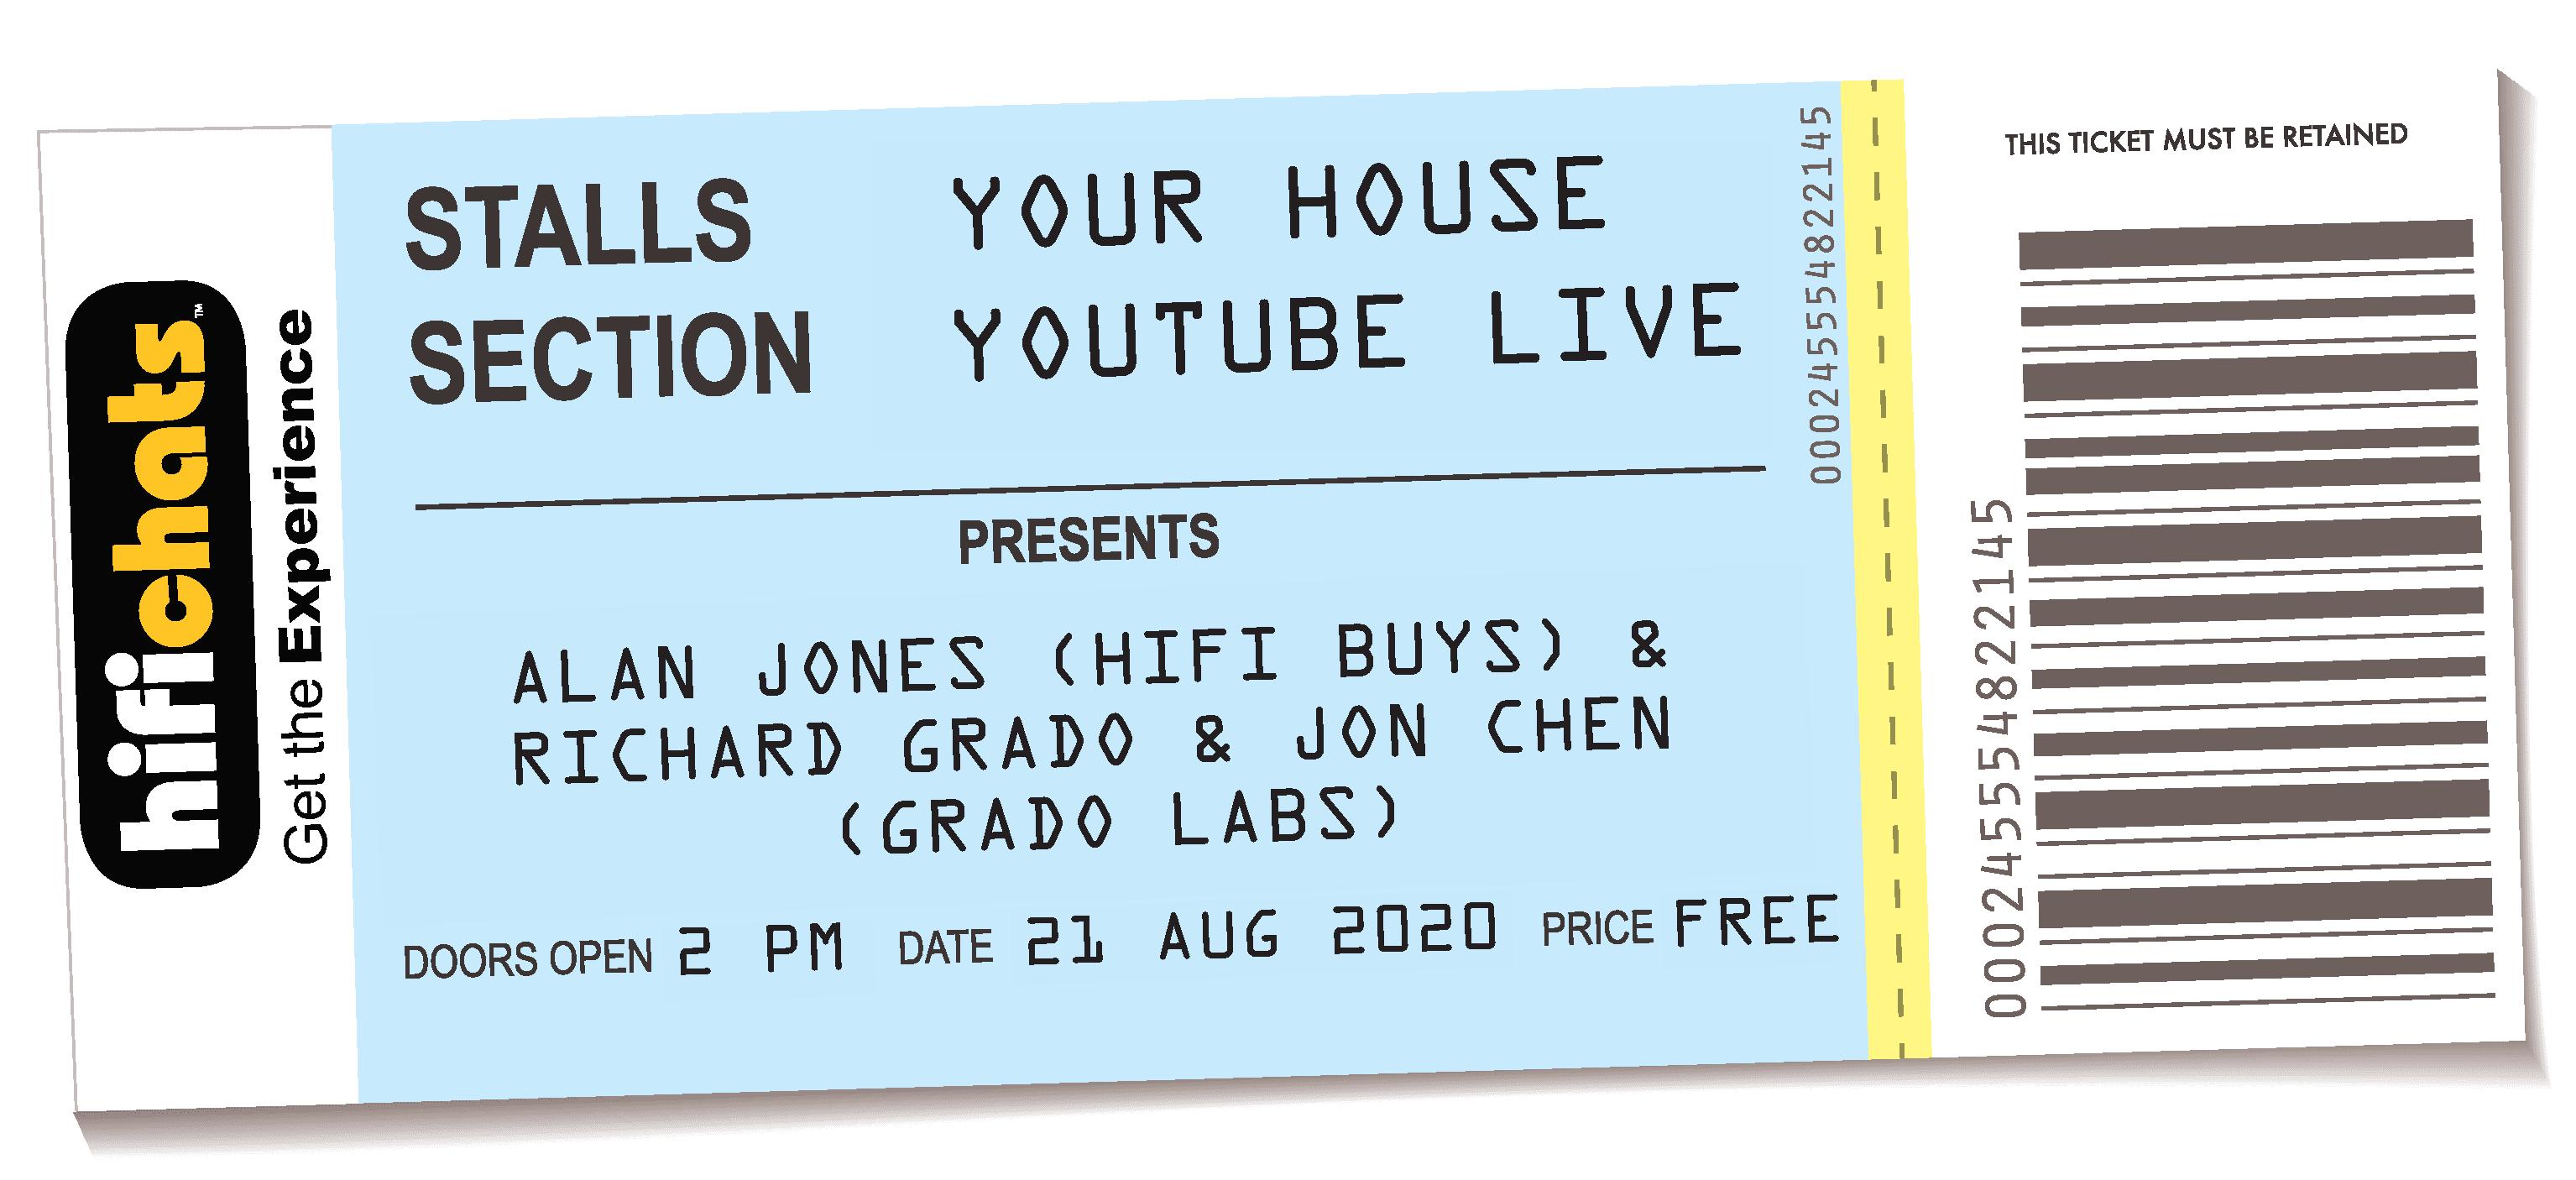 HFC Ticket Grado cropped